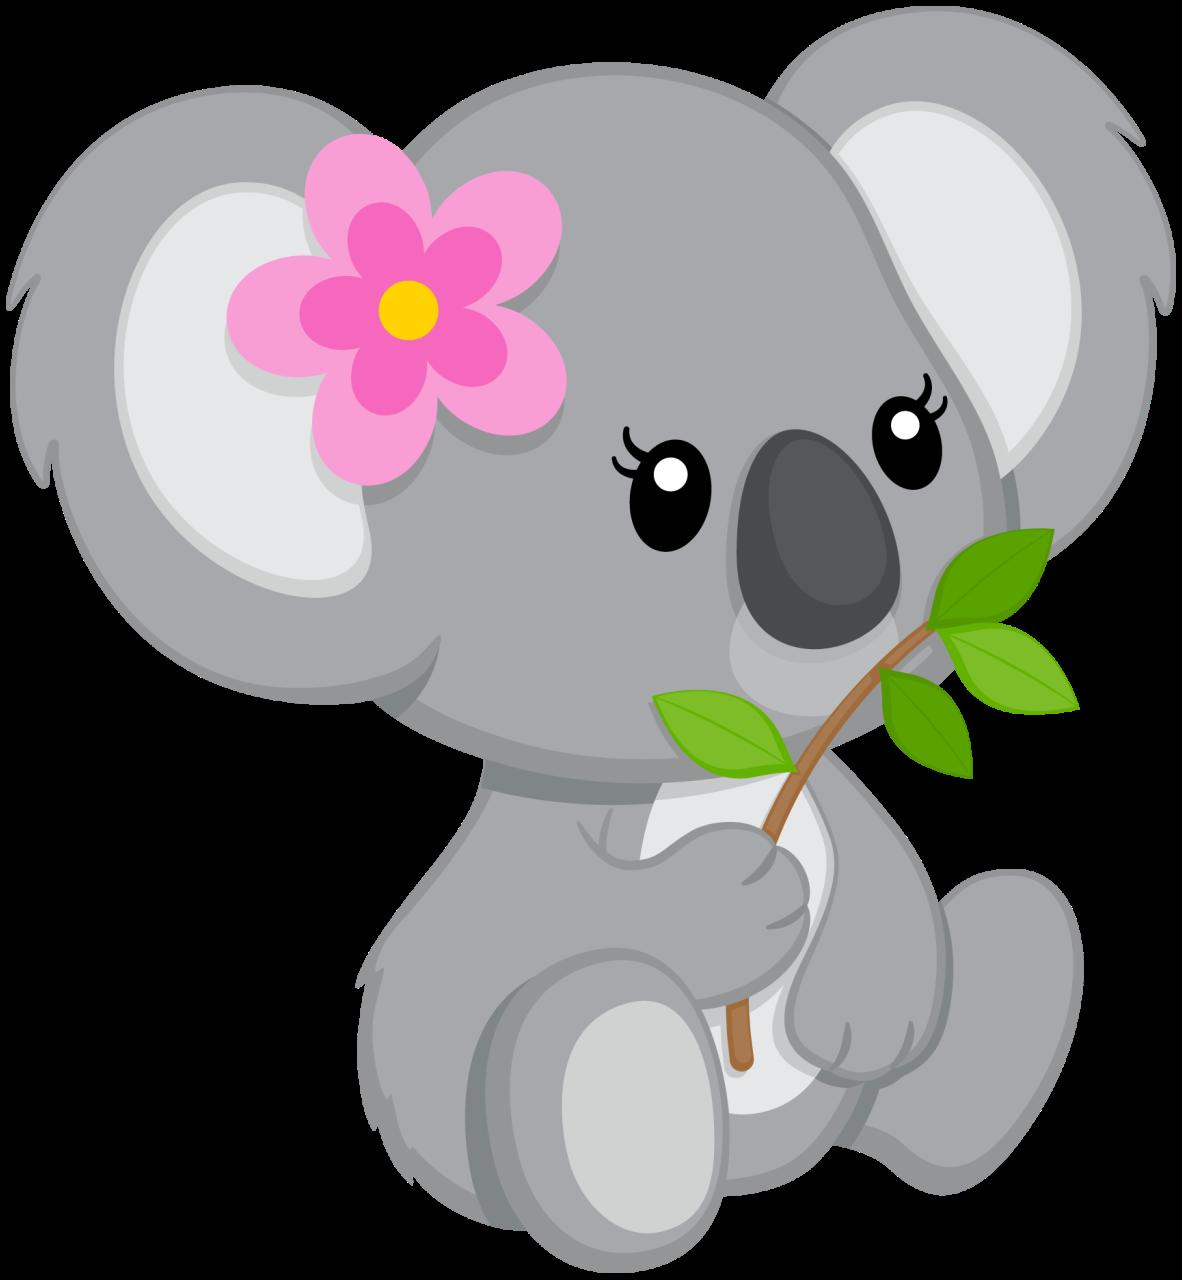 Racoon clipart grey object. Koala png pinterest clip